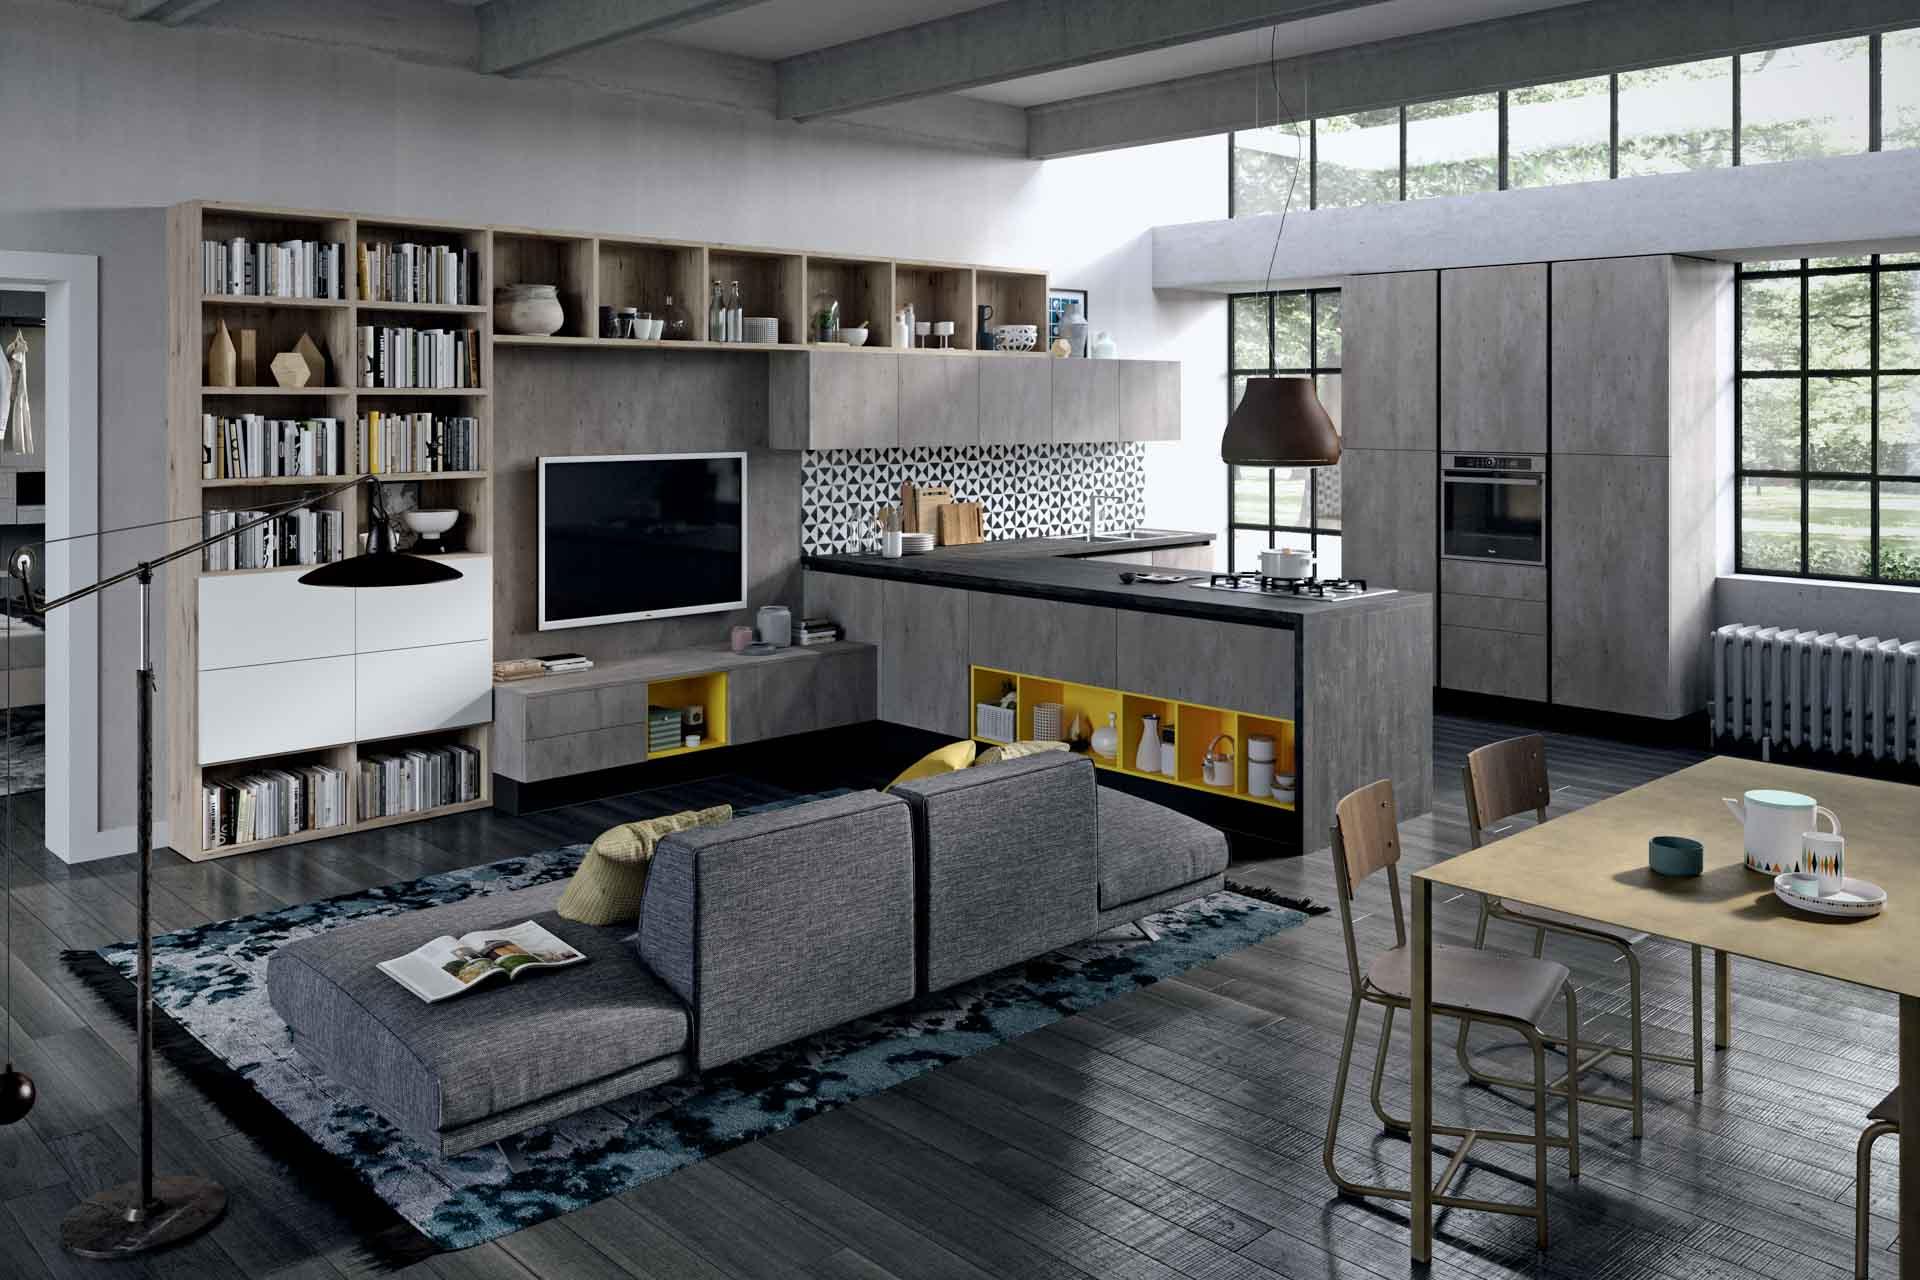 How to Design an Open Kitchen  European Cabinets & Design